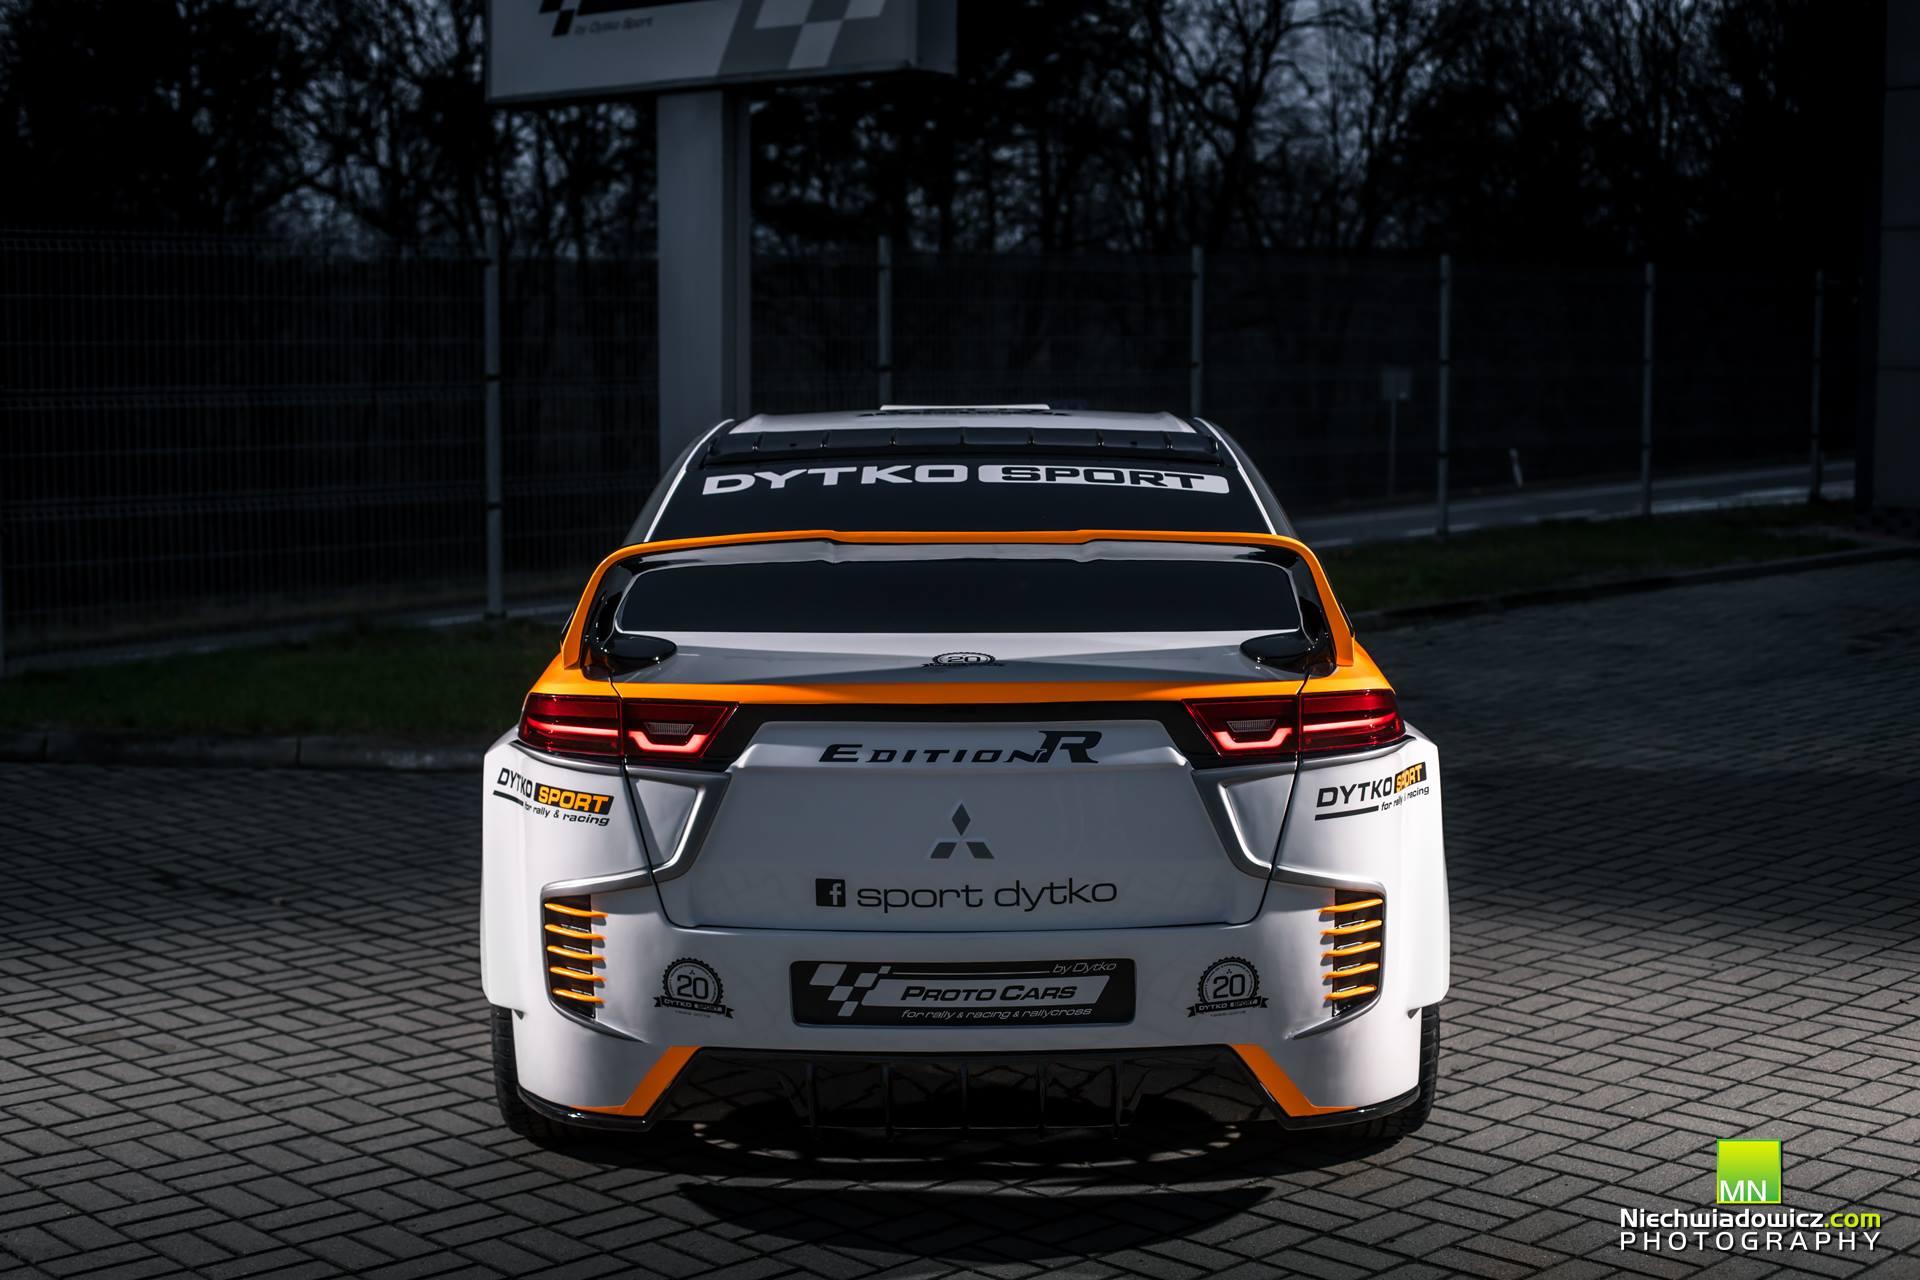 Mitsubishi_Lancer_Edition_R_by_Dytko_Sport_0005